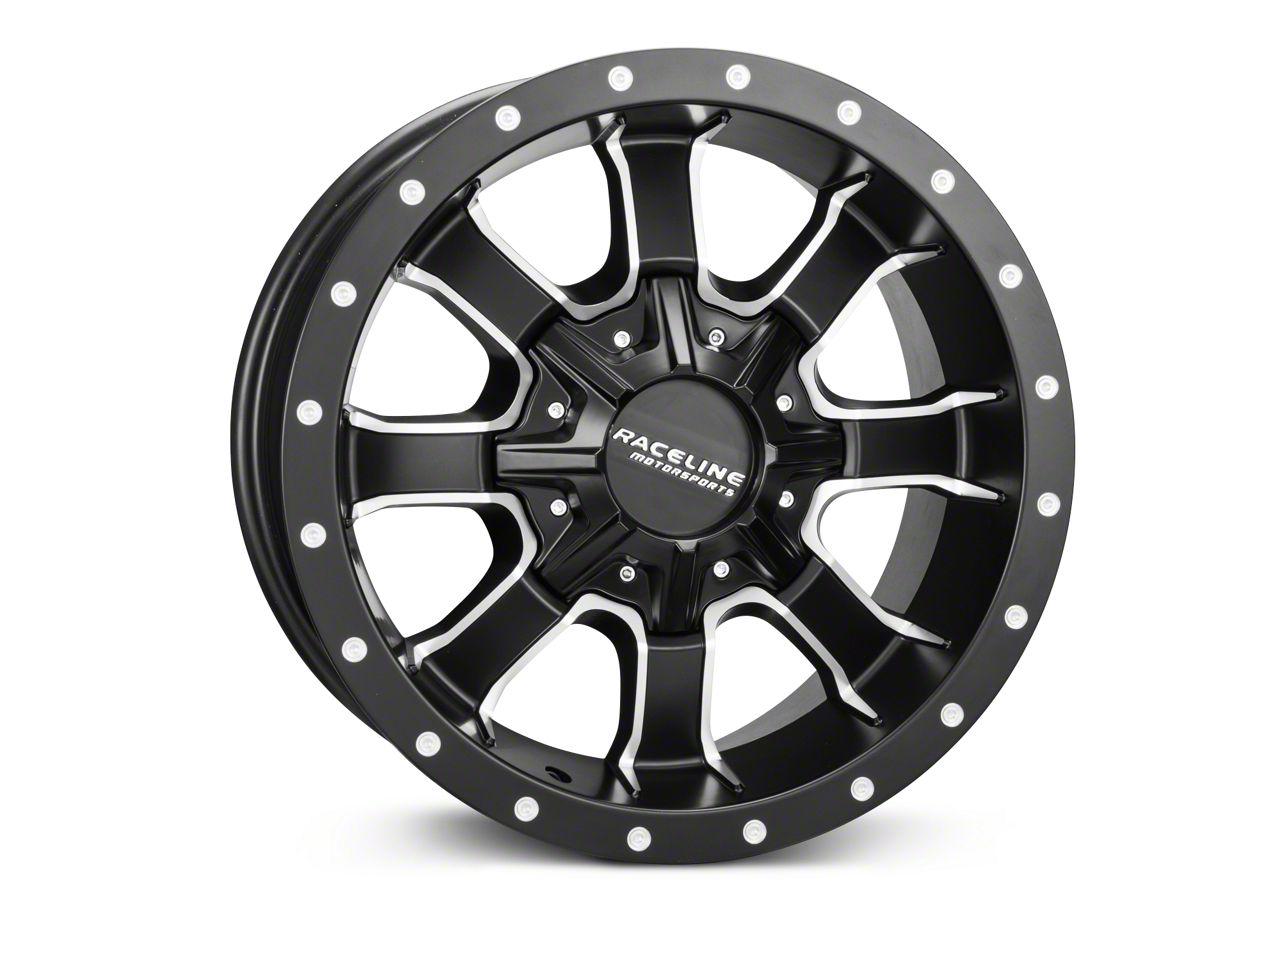 Raceline Mamba Black Milled Wheel - 20x9 (07-18 Jeep Wrangler JK; 2018 Jeep Wrangler JL)